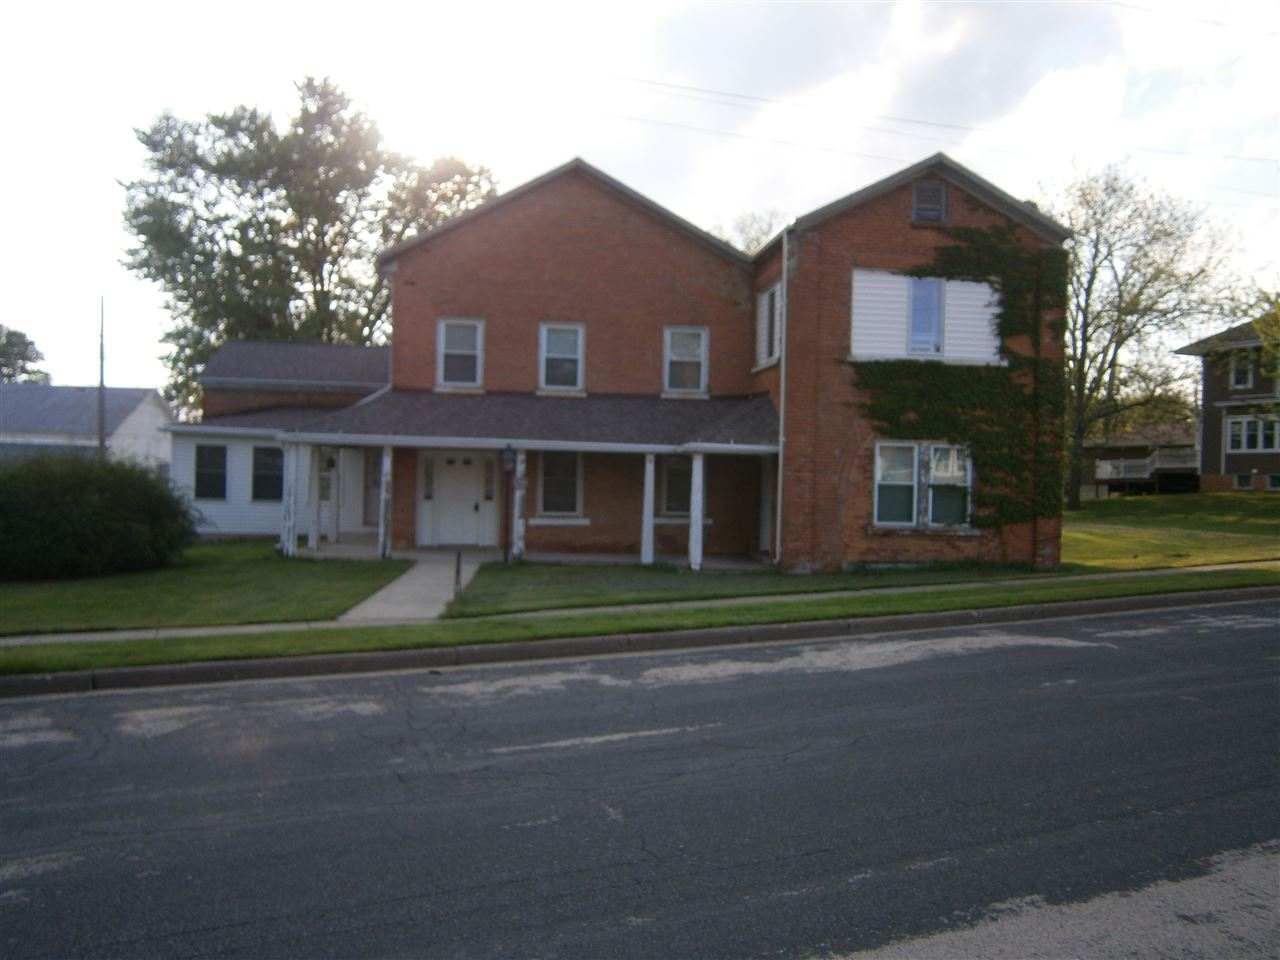 305 N Judgement St, Shullsburg, WI 53586